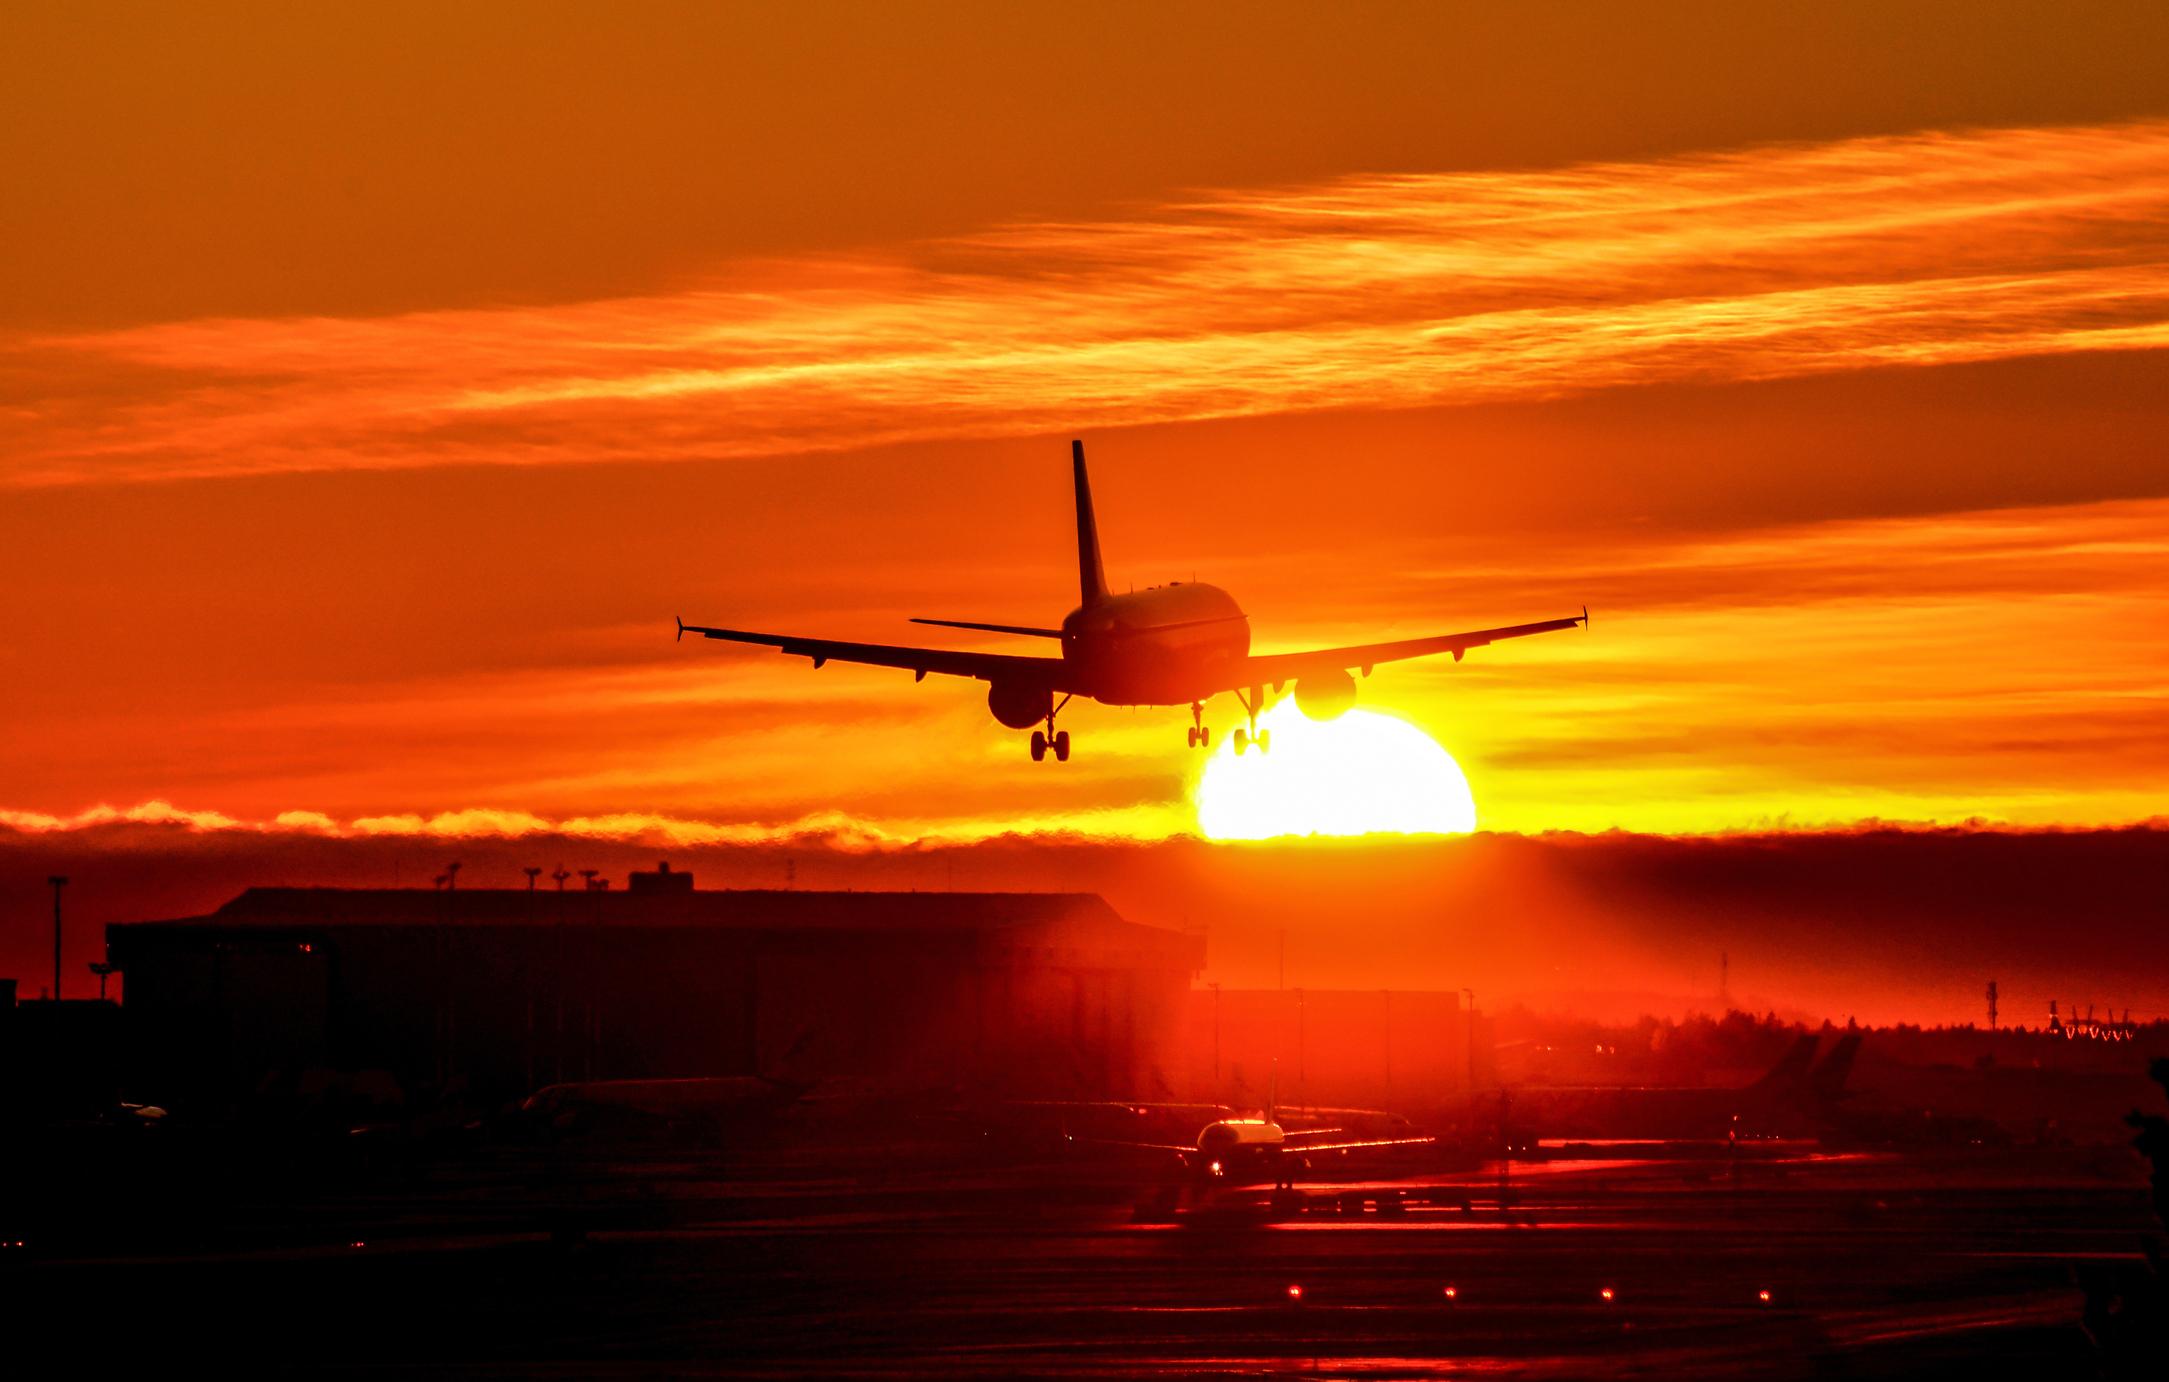 A plane landing as the sun sets